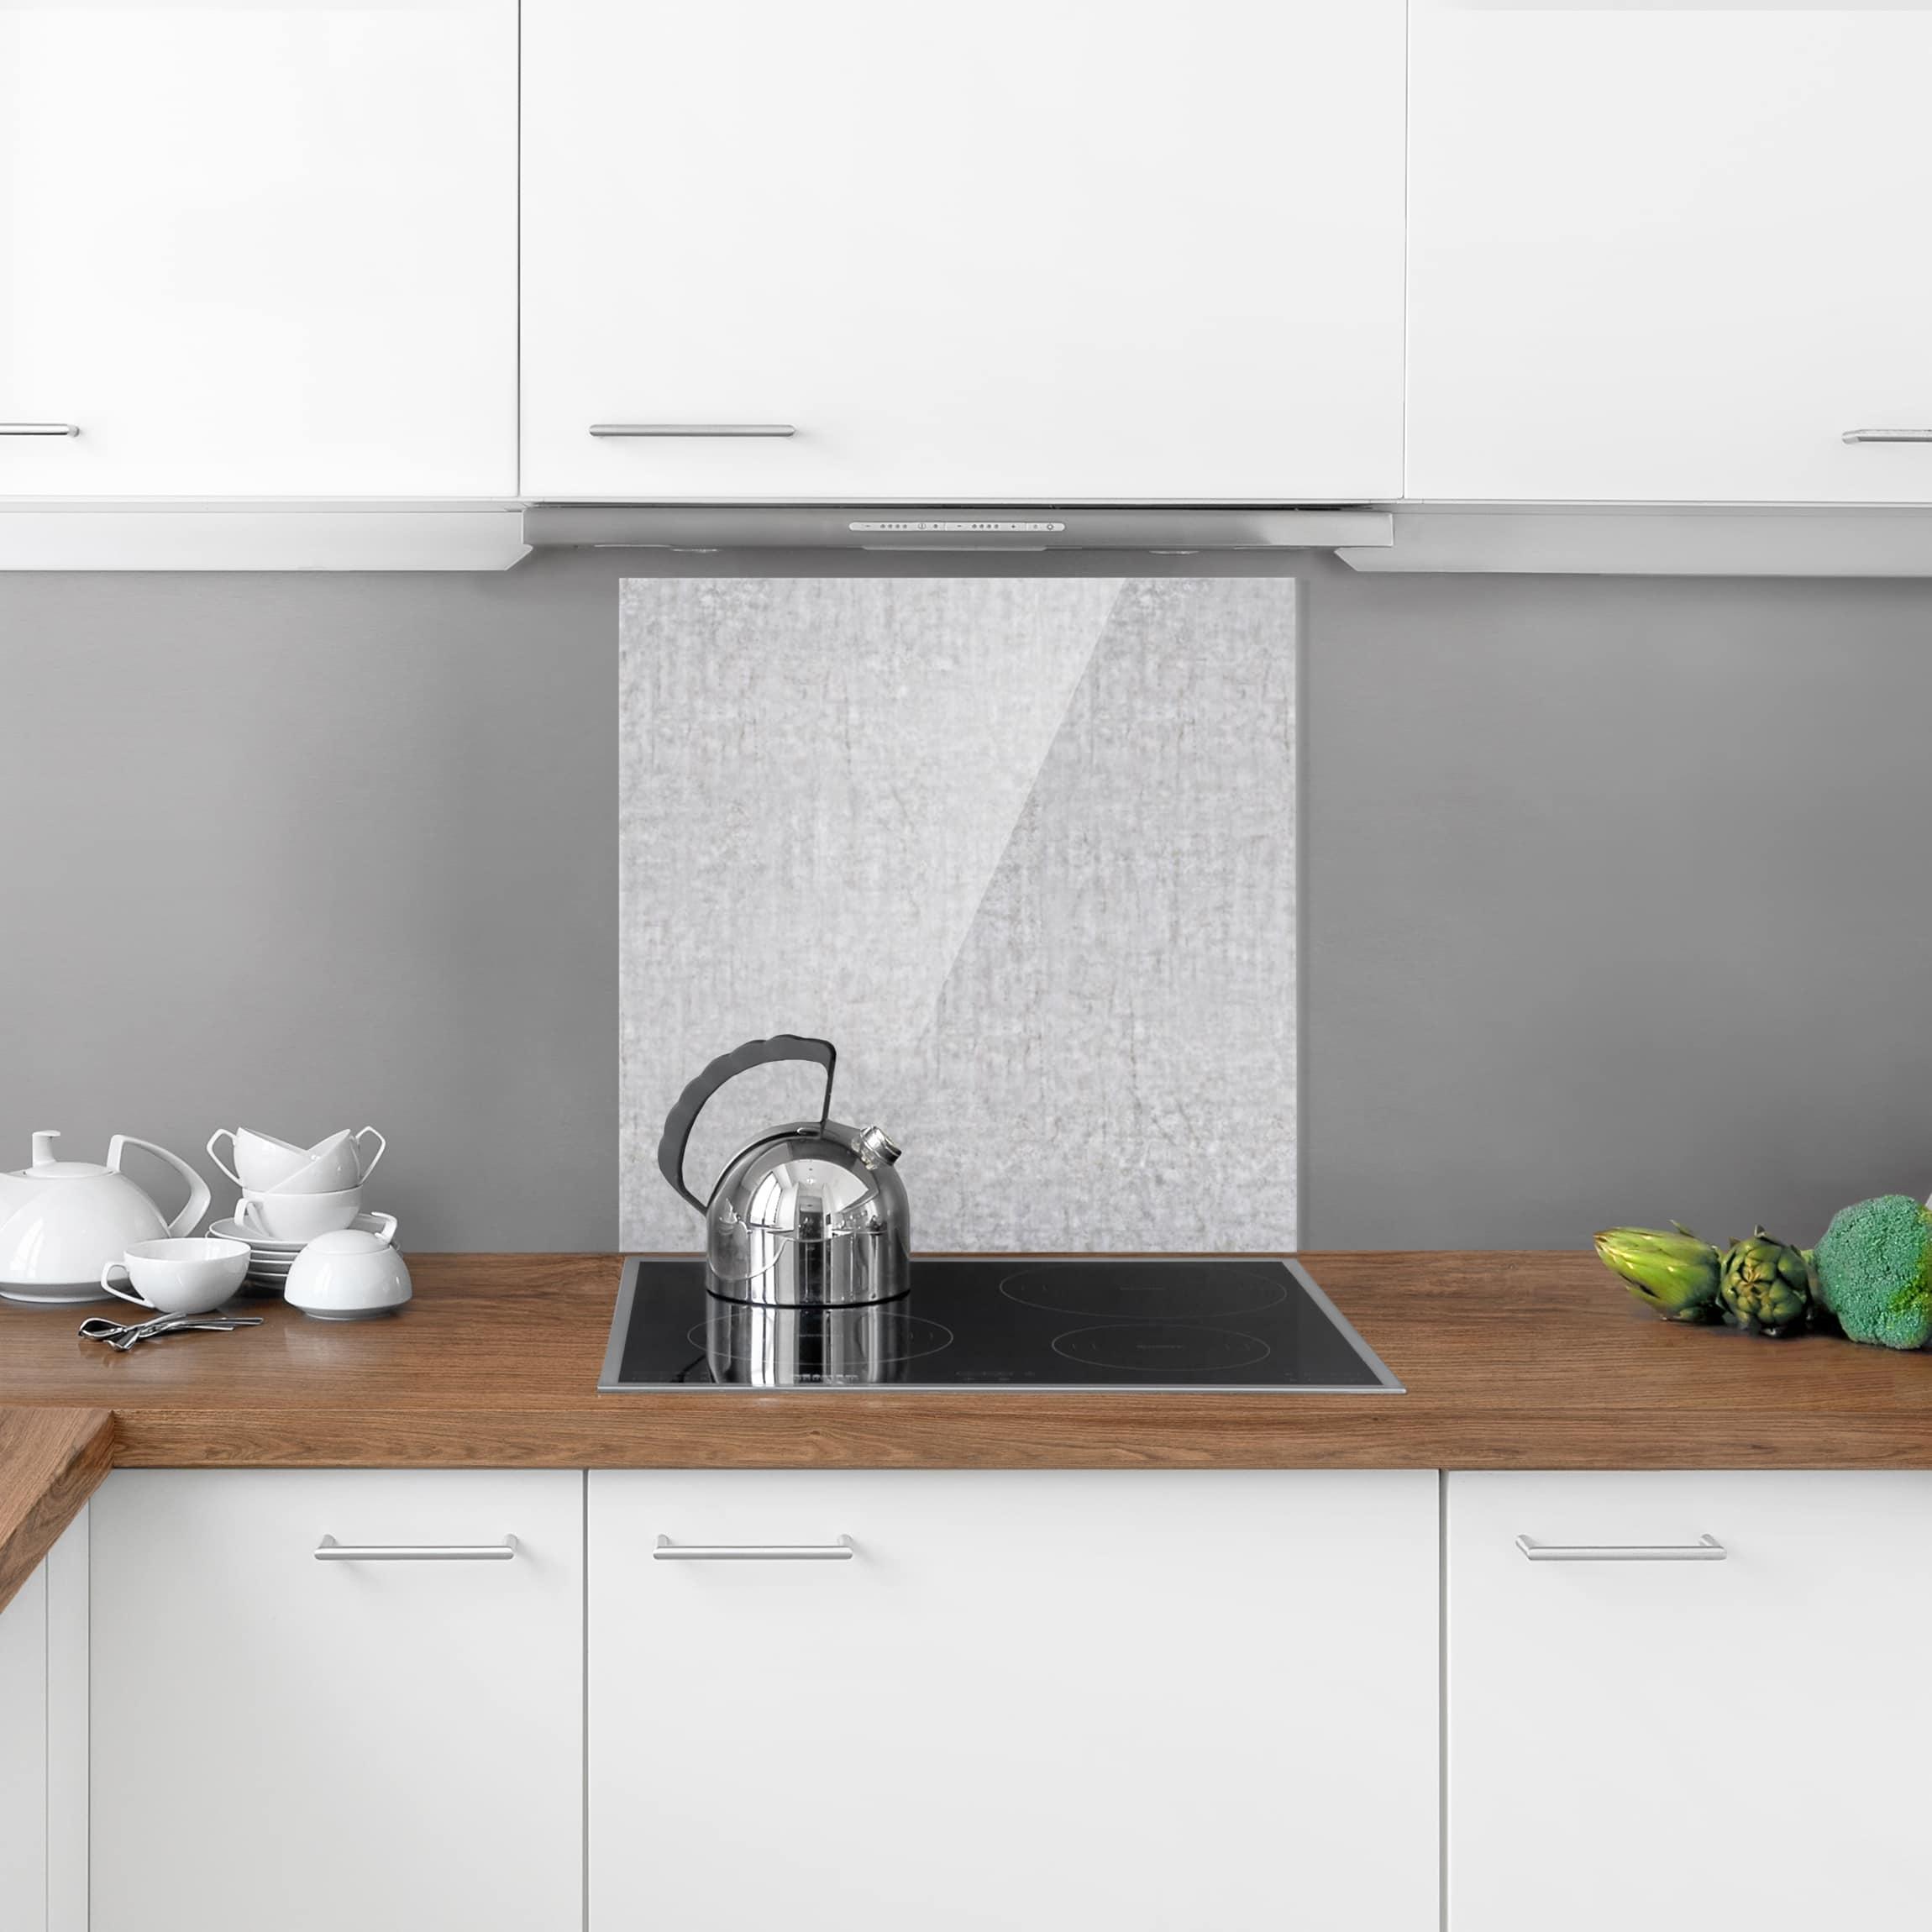 spritzschutz glas beton cir quadrat 1 1. Black Bedroom Furniture Sets. Home Design Ideas